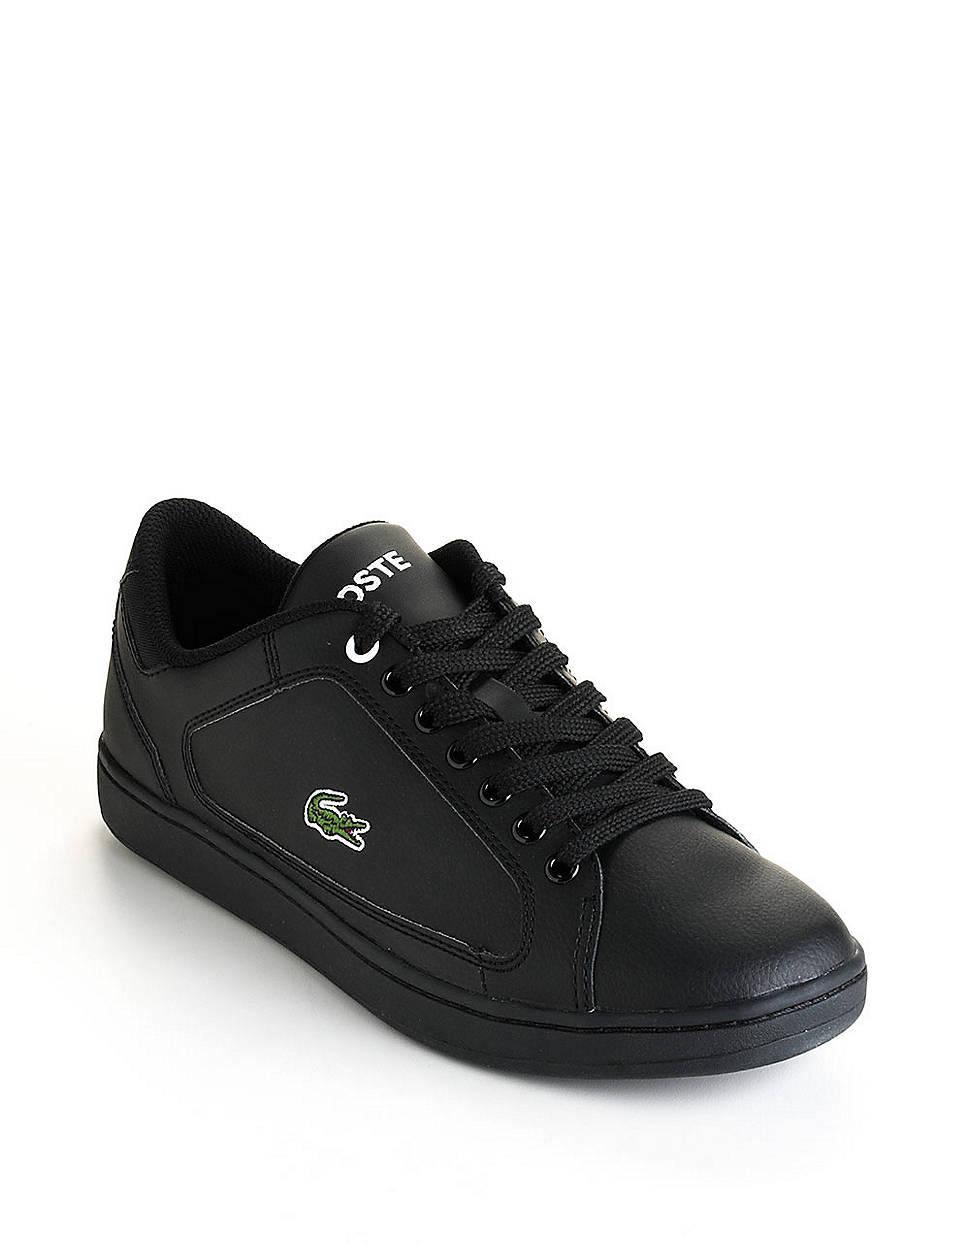 3eac831dec0ba Lacoste Nistos Tennis Shoes in Black for Men - Lyst